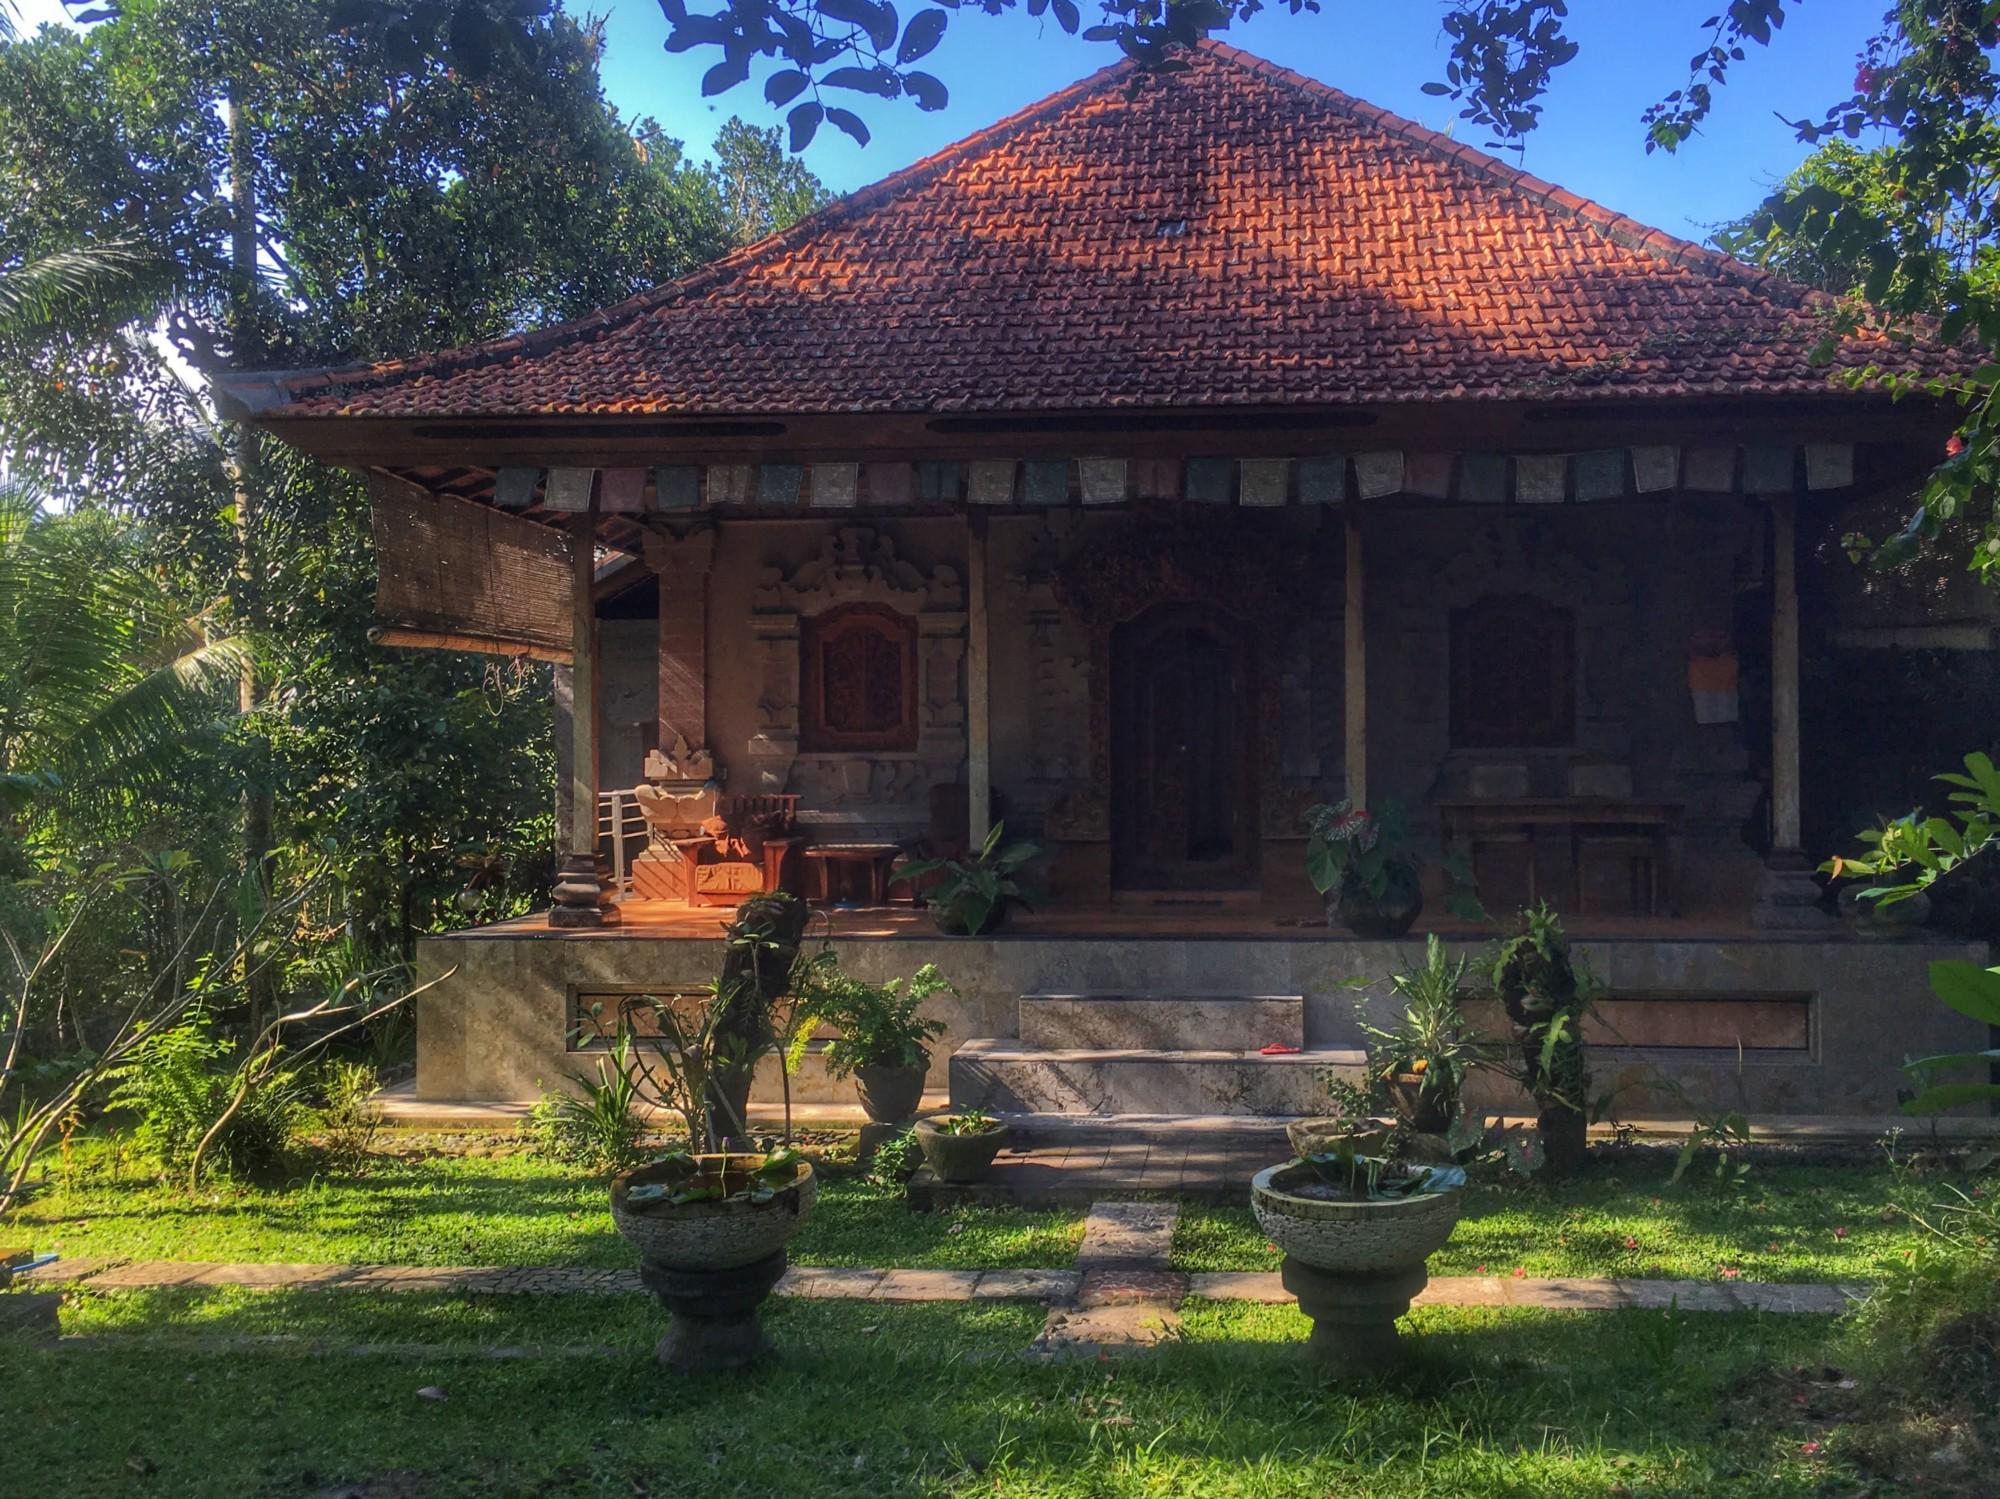 Tibet Garden  Villa AirBnb. Ubud, Bali 2016.